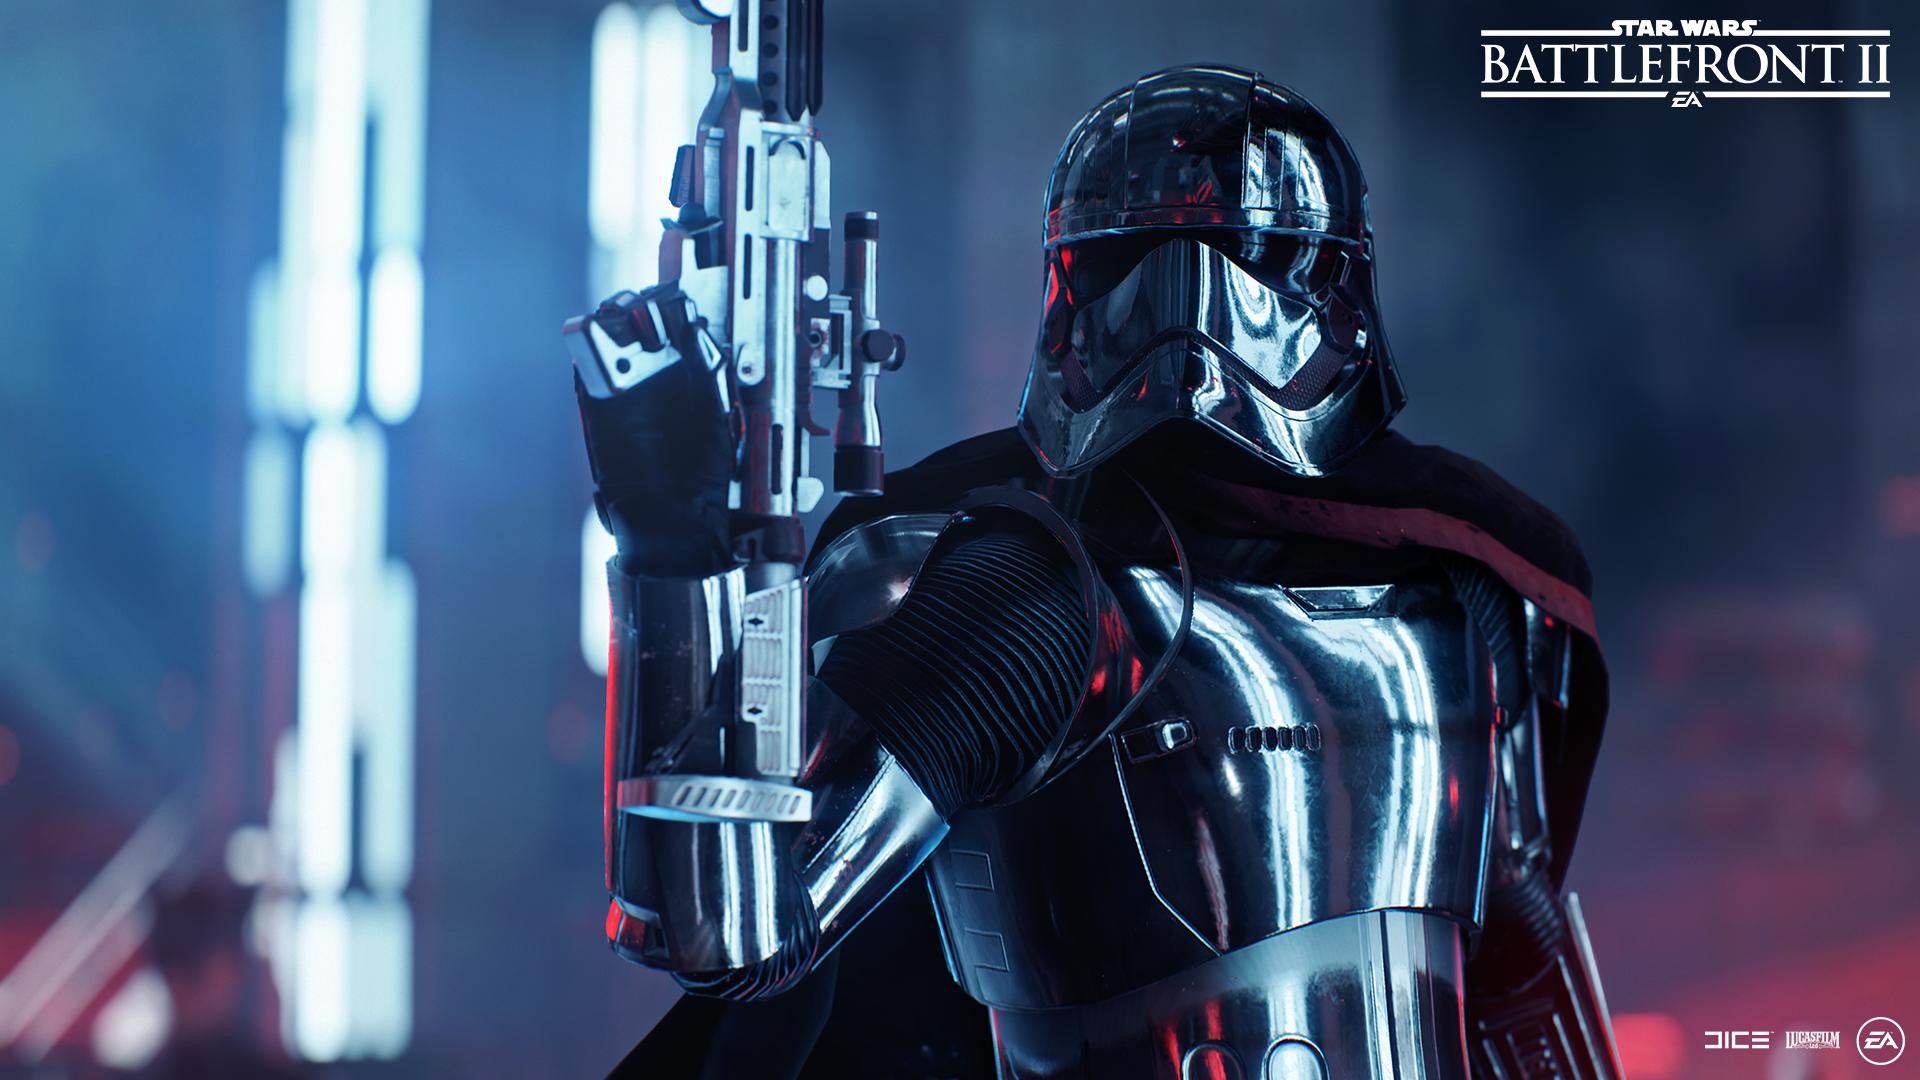 Star Wars: Battlefront 2 character Captain Phasma